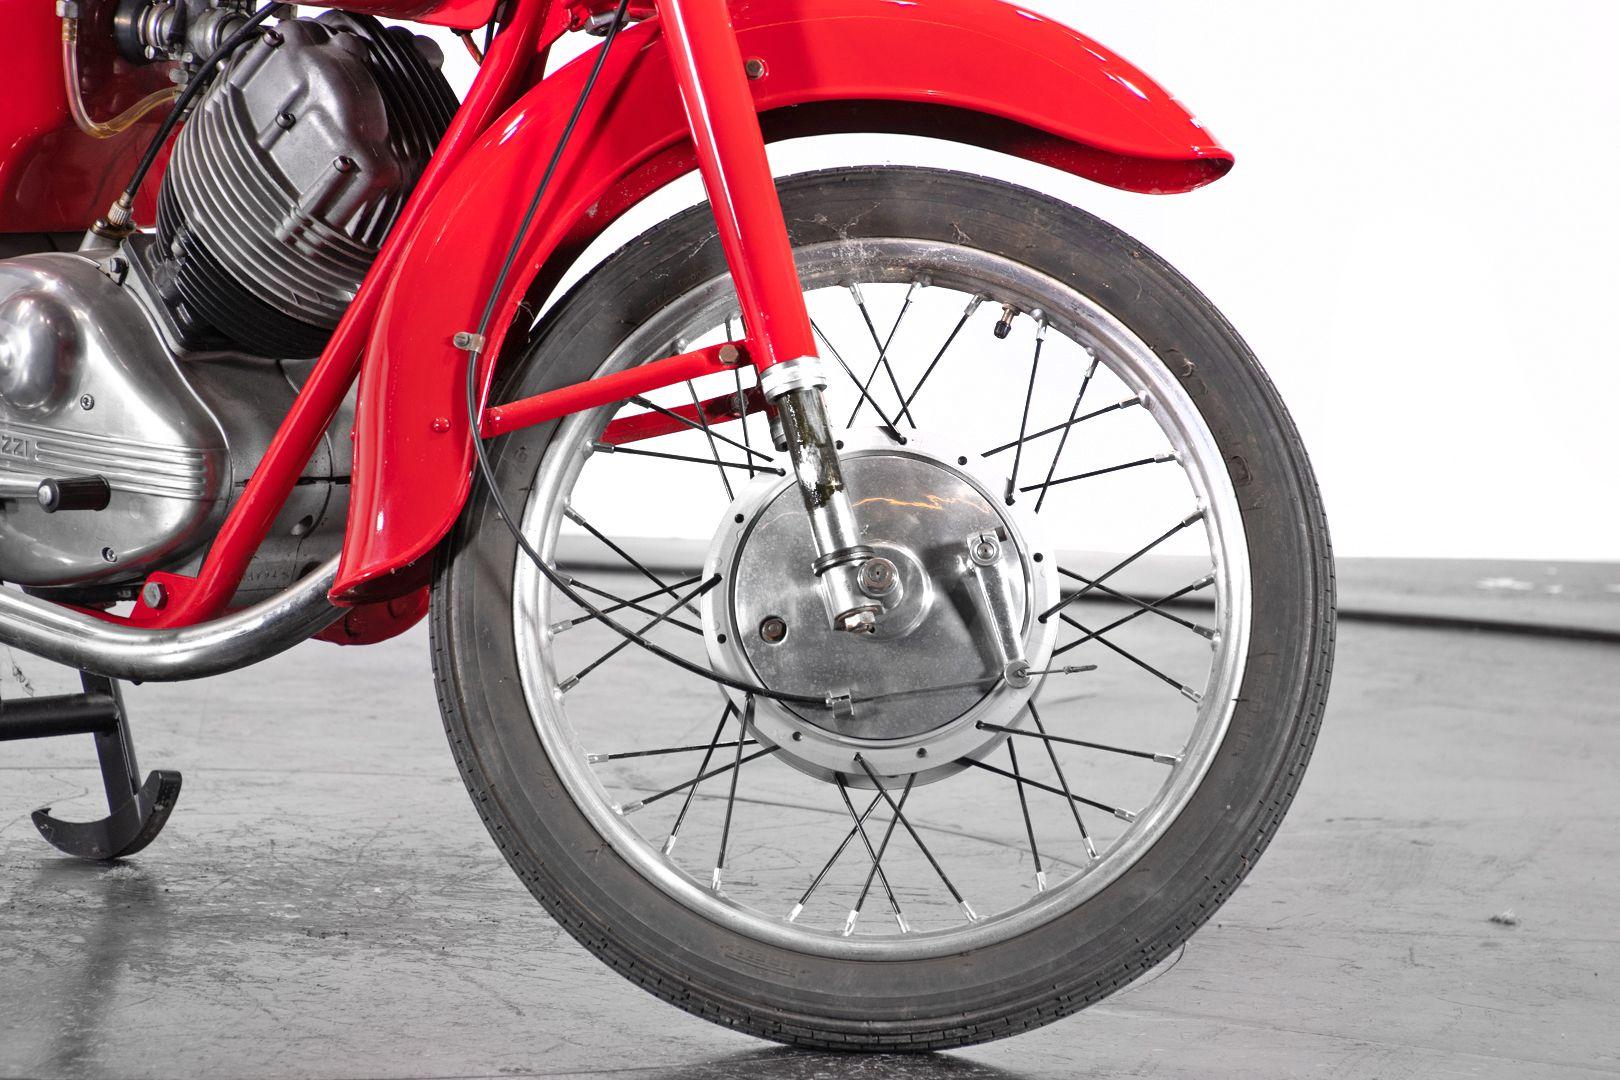 1959 Moto Guzzi Lodola 235 GT 41881